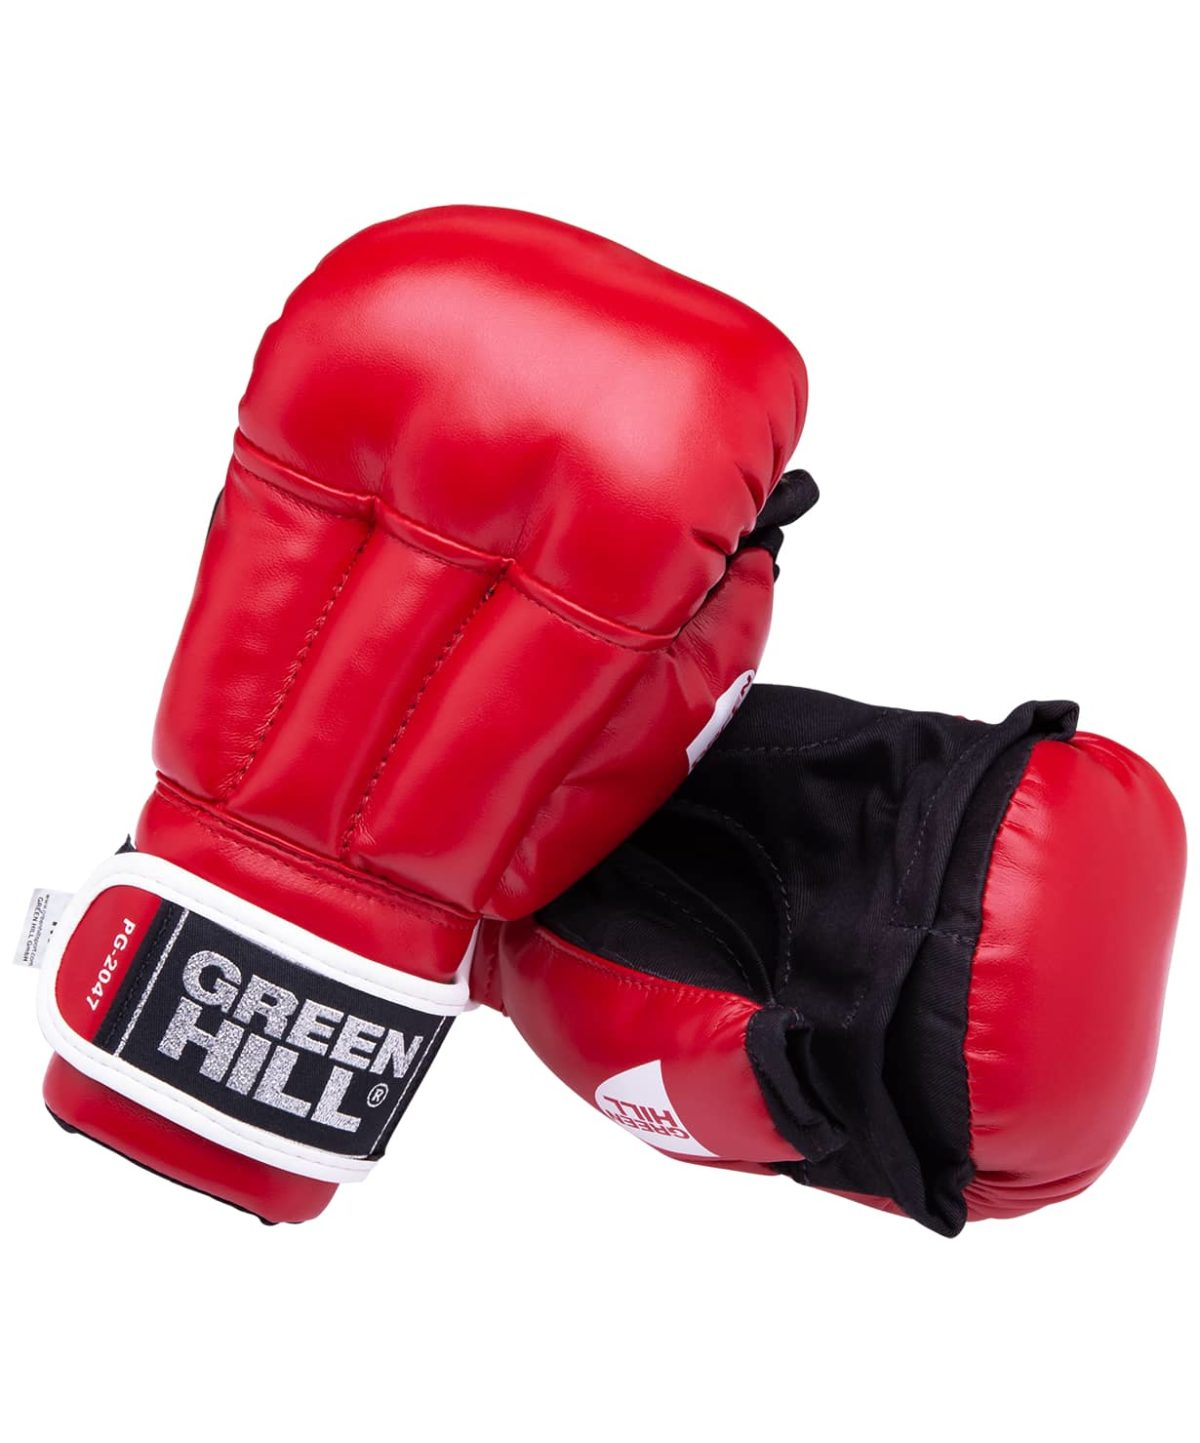 GREEN HILL Перчатки для рукопашного боя, к/з  PG-2047 - 1